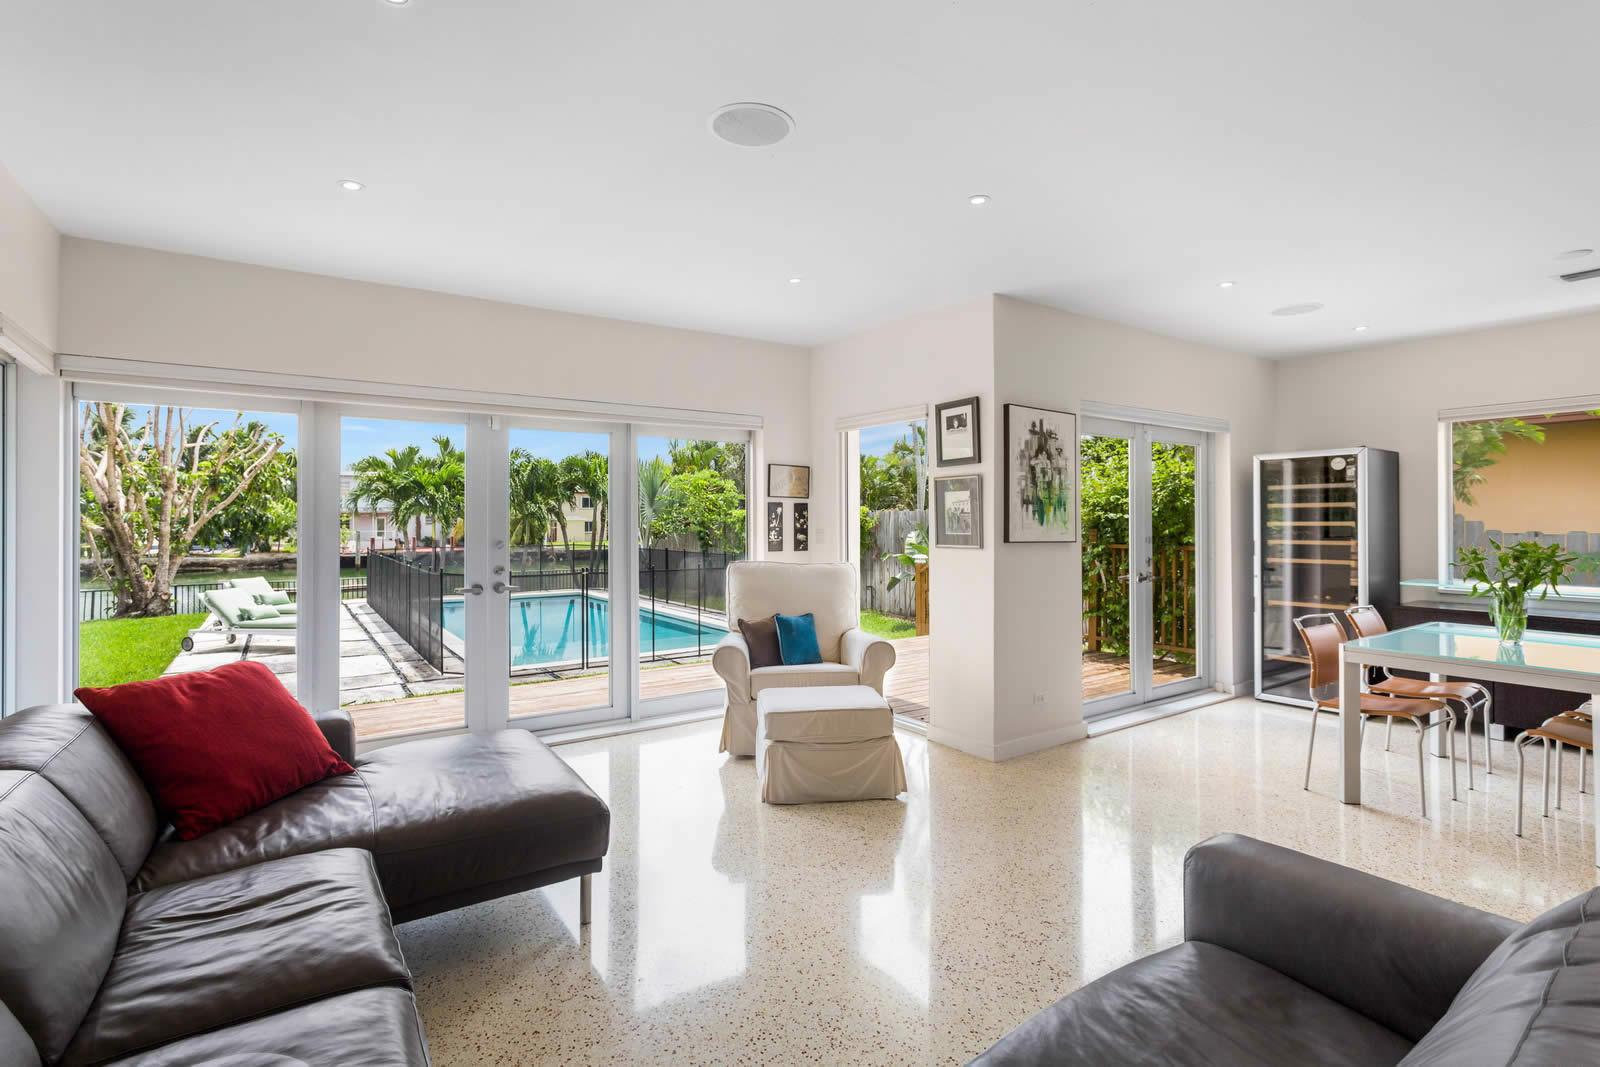 villa-lumineuse-master-bedroom-immense-dressing-piscine-eau-salee-a-vendre